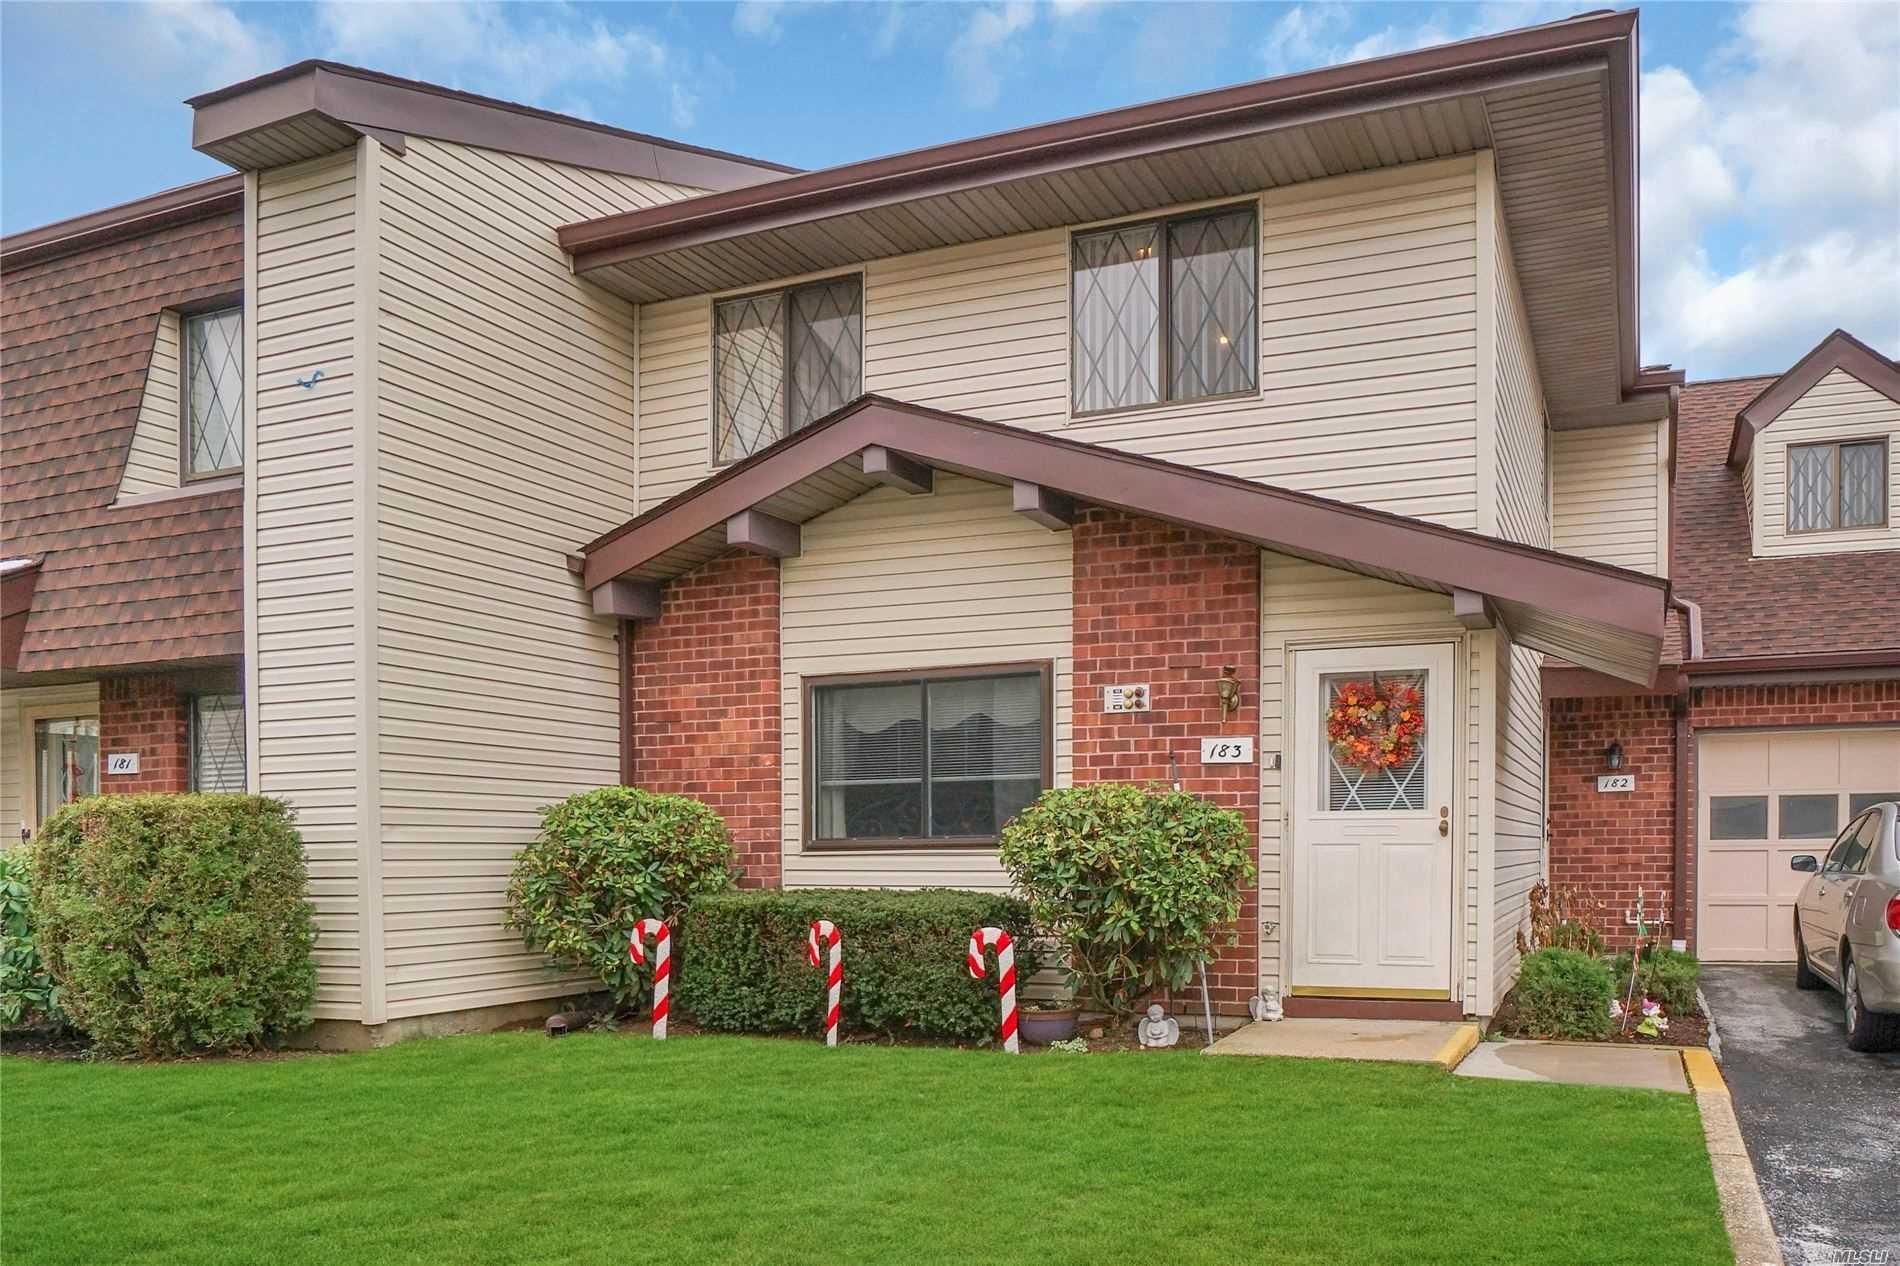 Property for sale at 183 E Cambridge Drive # 183, Copiague NY 11726, Copiague,  New York 11726